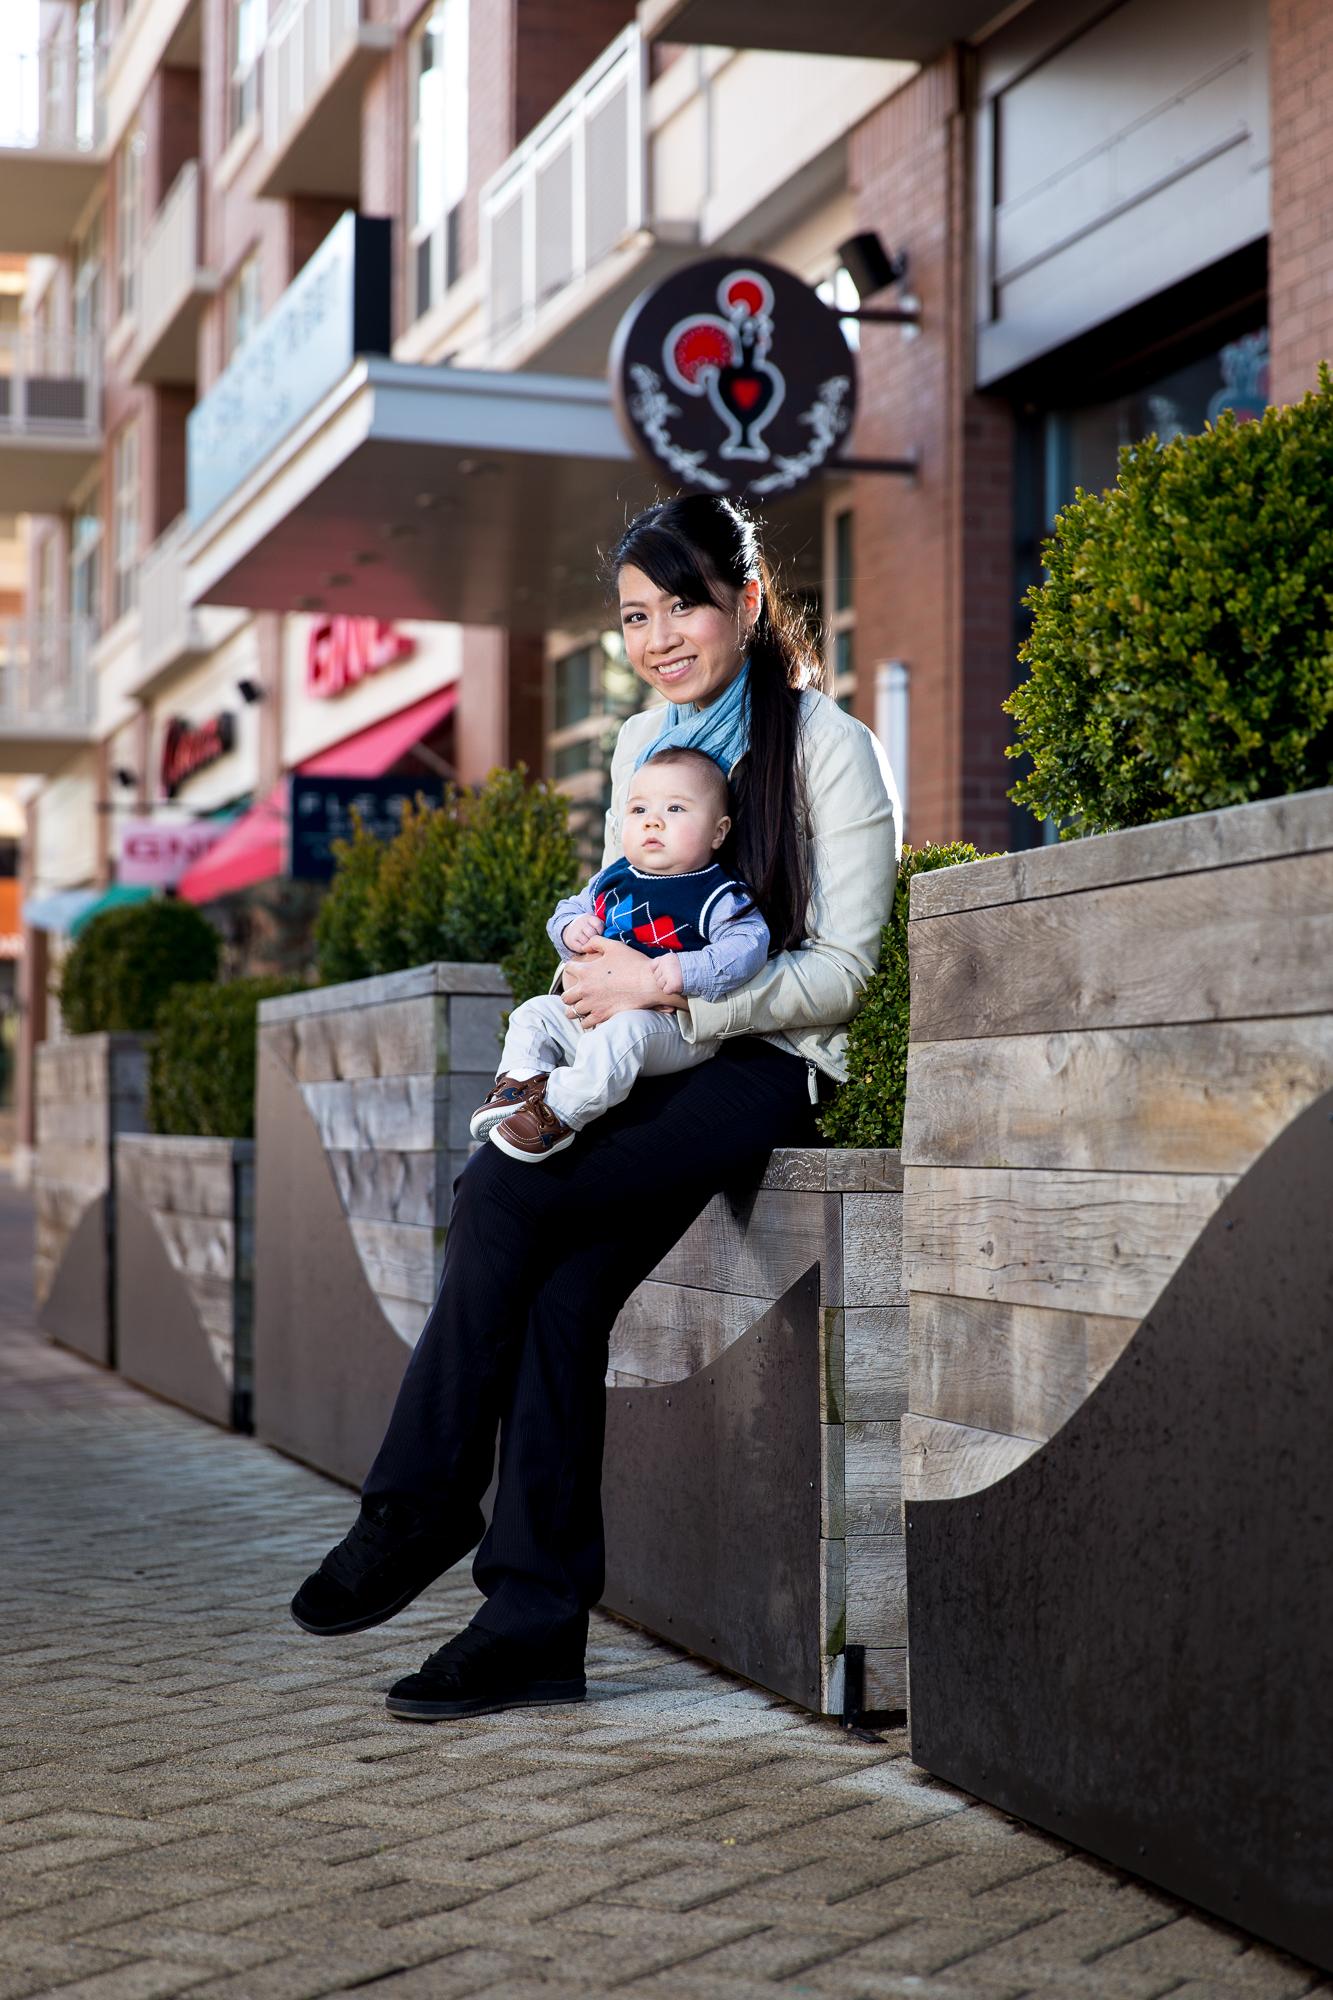 Blakes-Family-March-2014-16.jpg